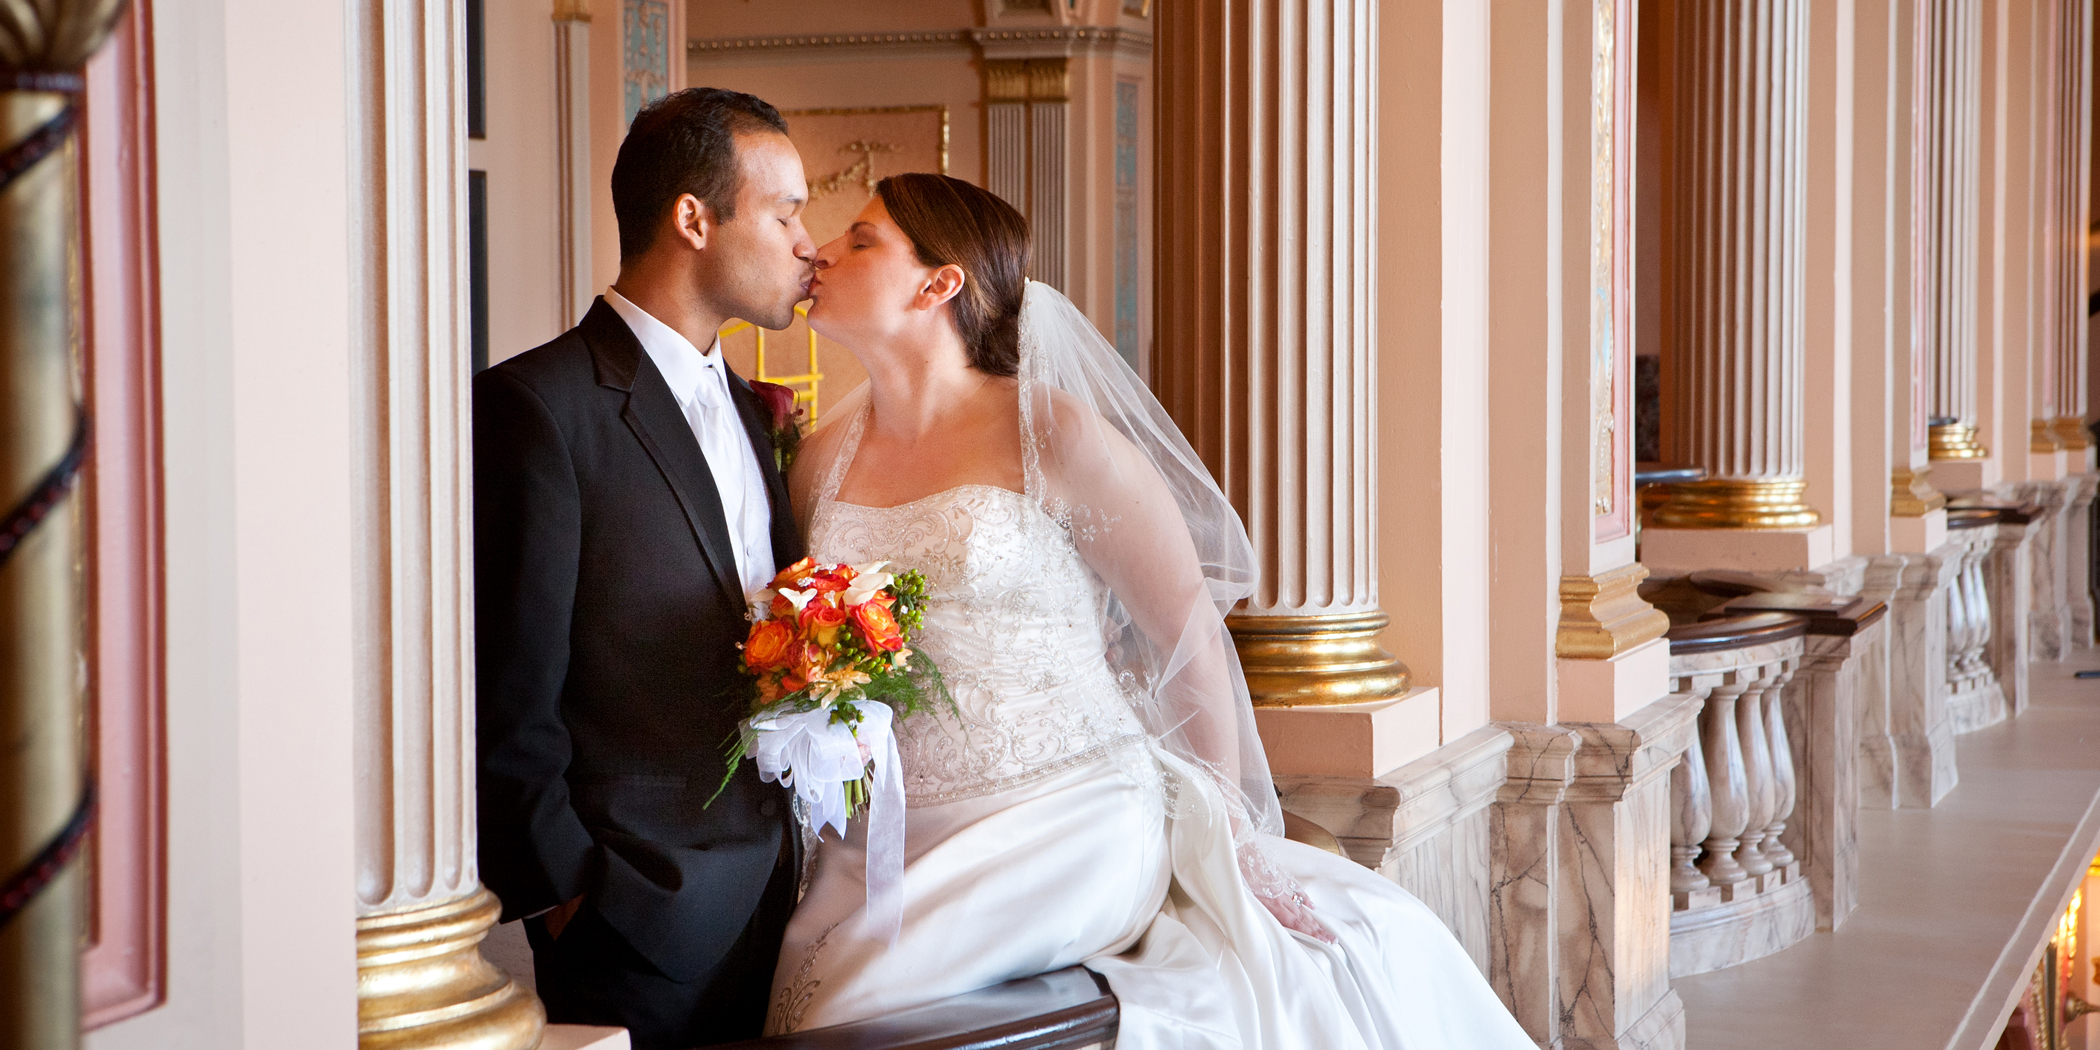 Wedding-Photography-Palaise-Royale-South-Bend-Indiana_29.jpg